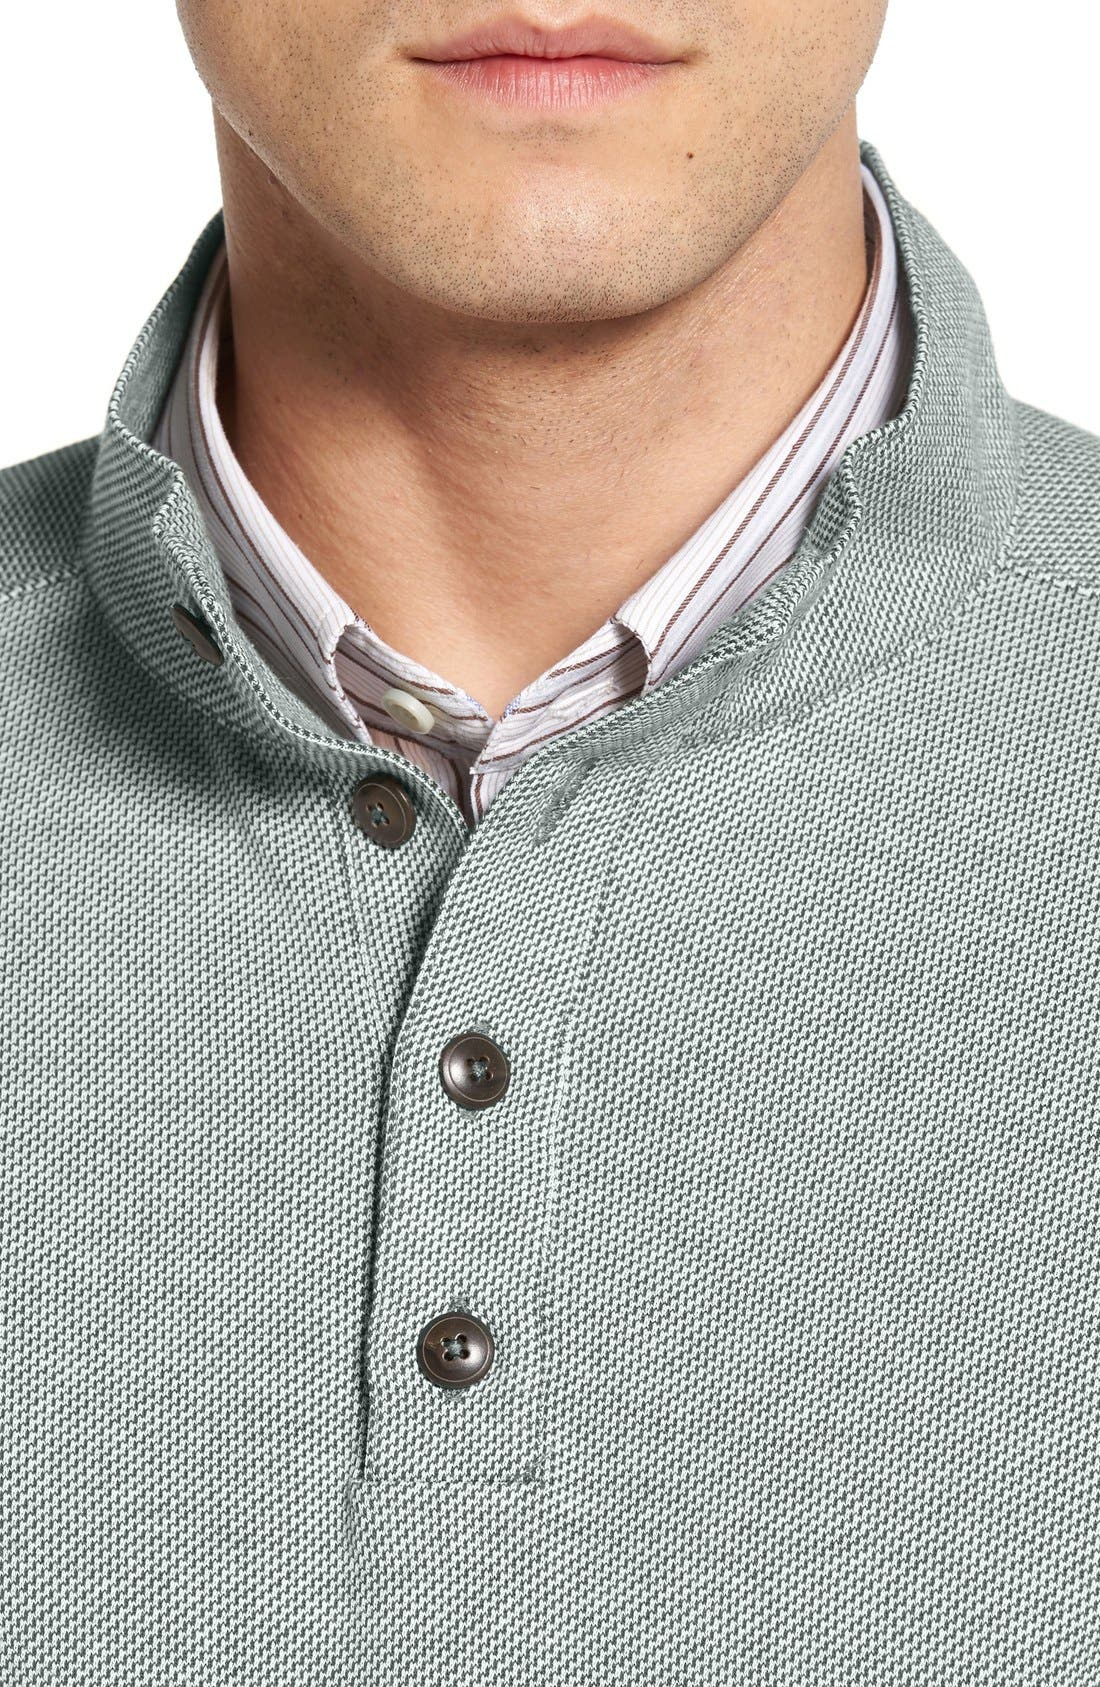 'Quinalt' Mock Neck Pullover,                             Alternate thumbnail 9, color,                             355